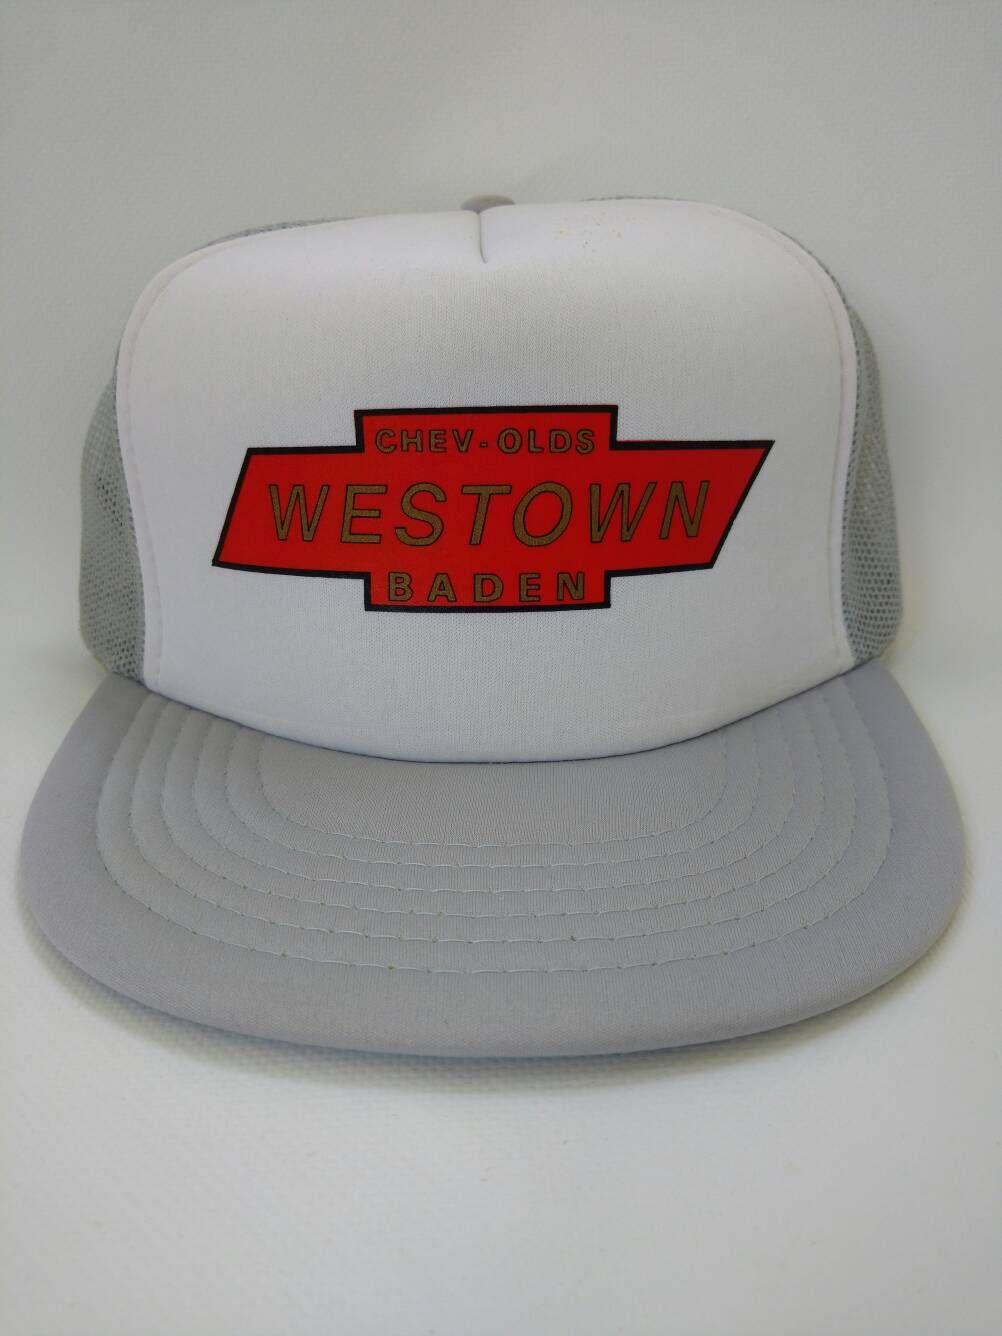 46113f6405f Chev-Olds Westown Baden Trucker Hat Snapback Cap Retro Vintage by  AllTheRageVintageCA on Etsy